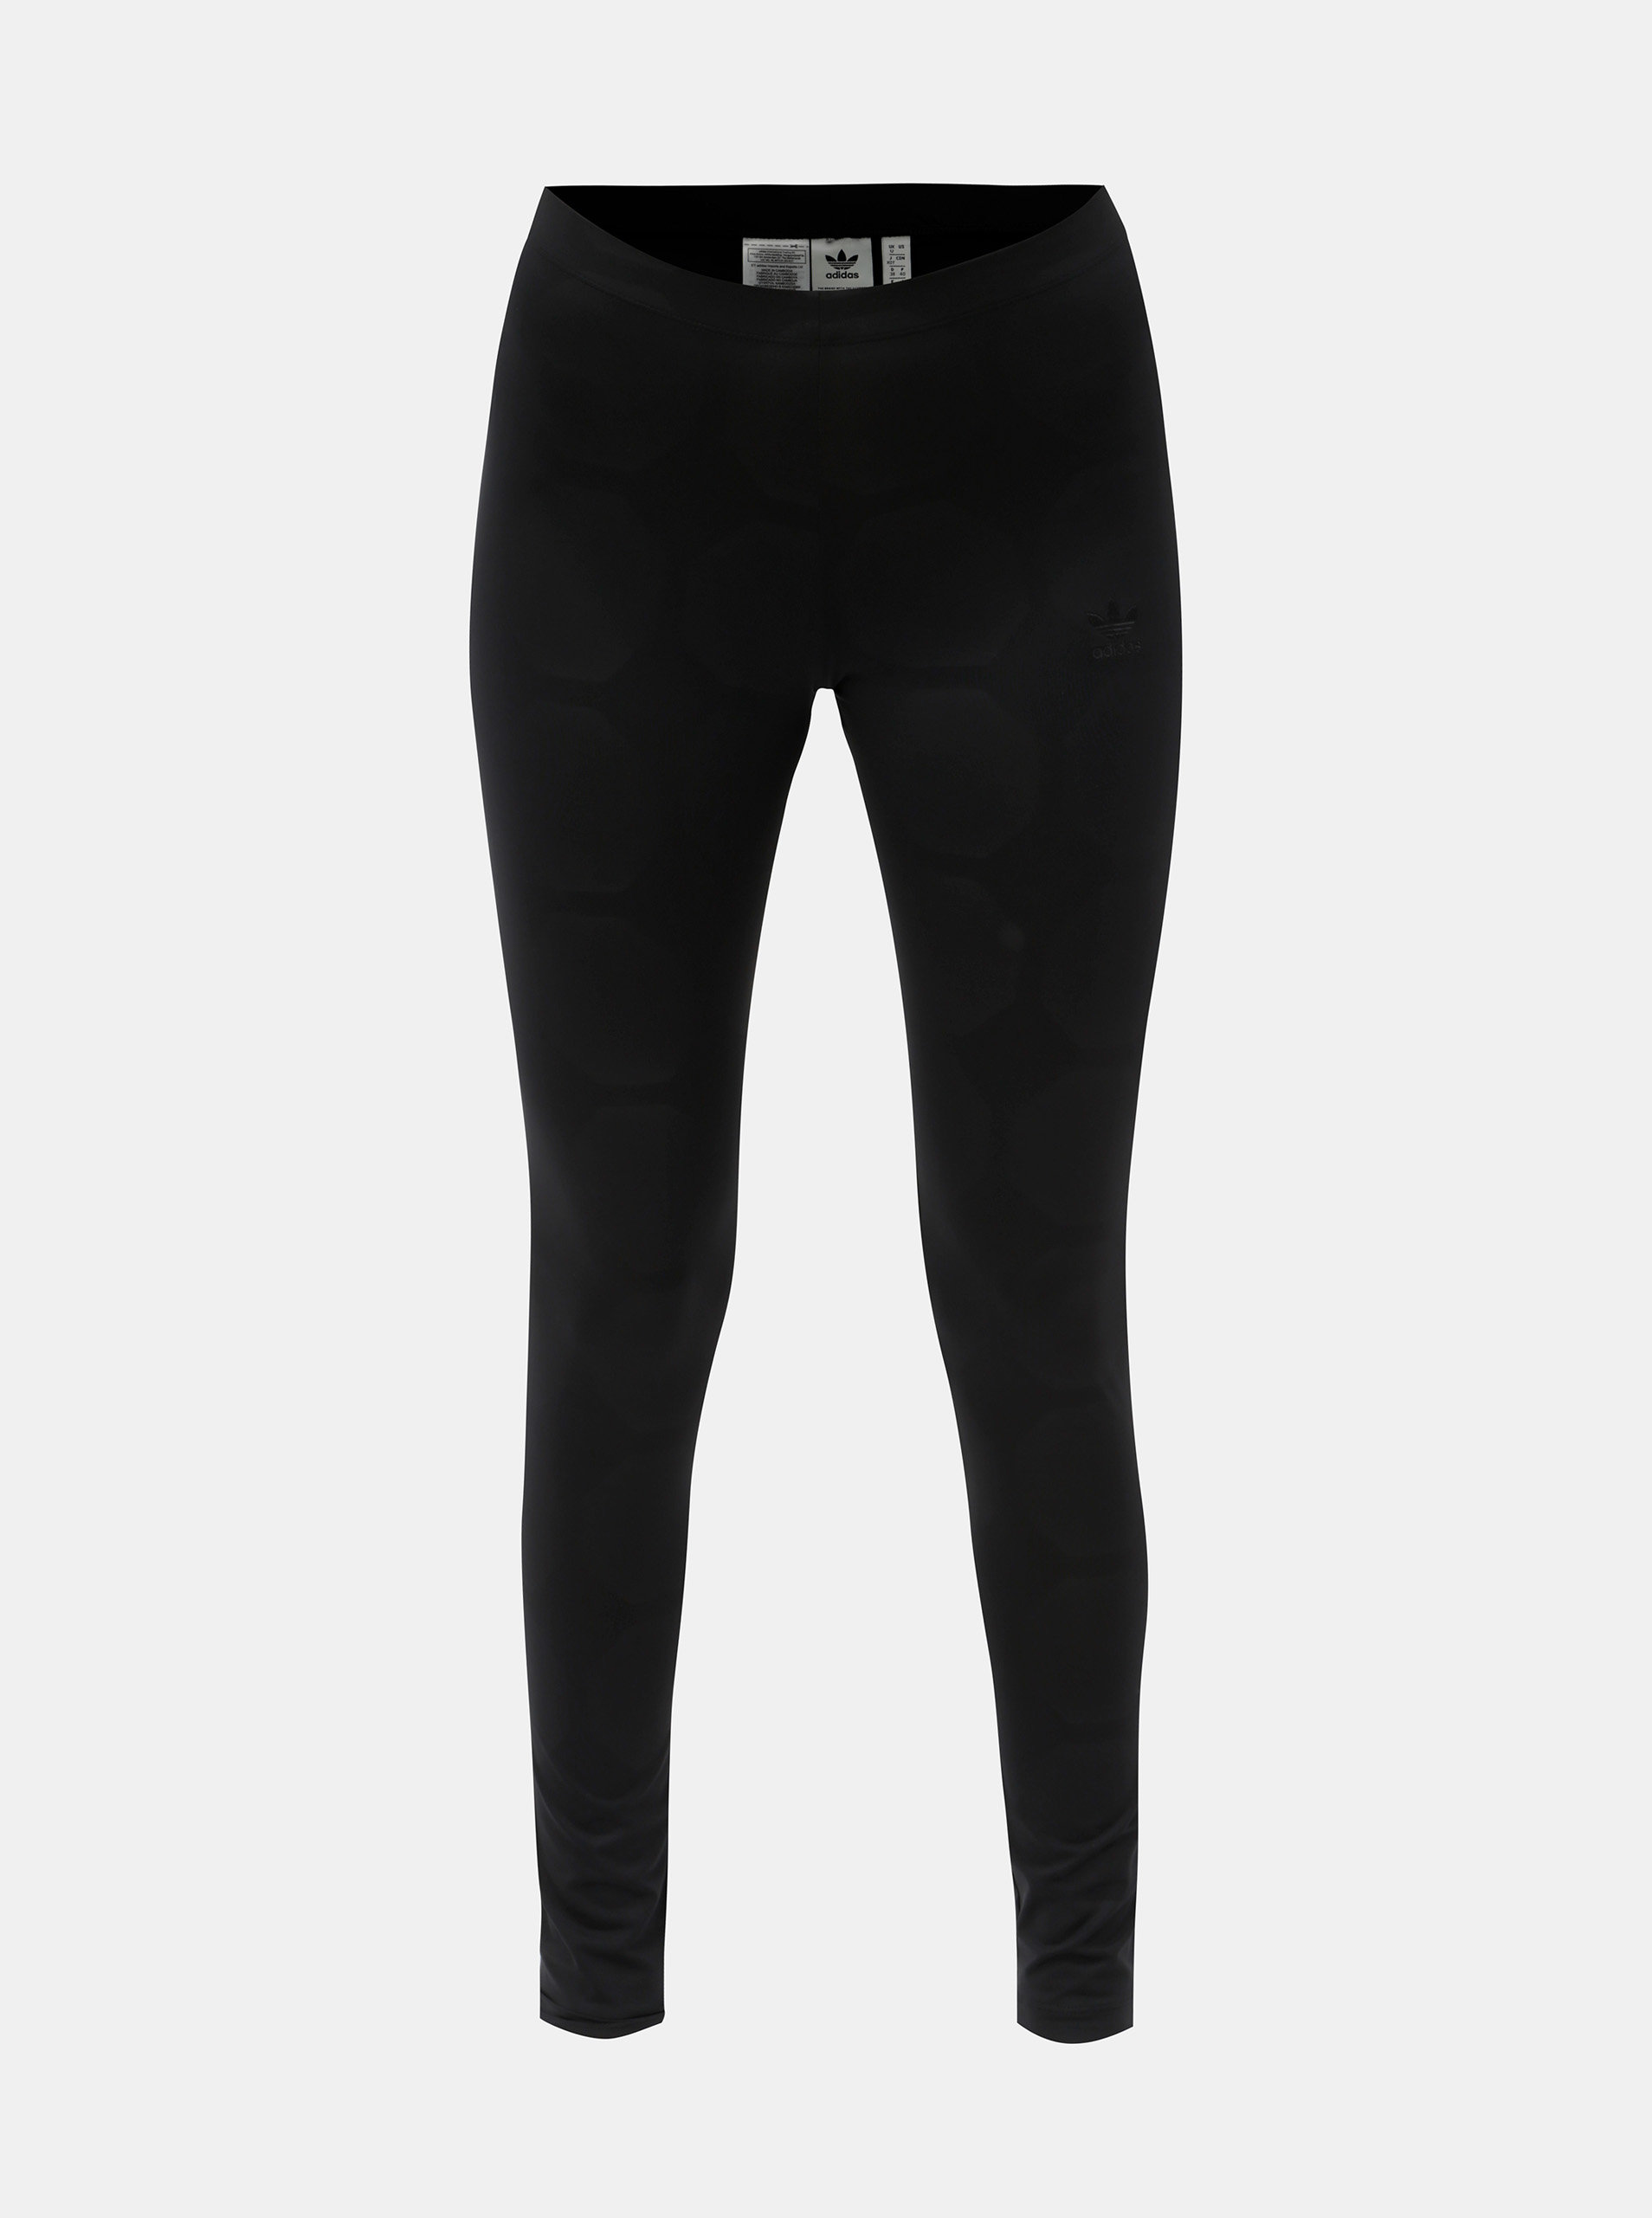 Černé dámské legíny s fotbalovým vzorem adidas Originals Tight ... b77f072443